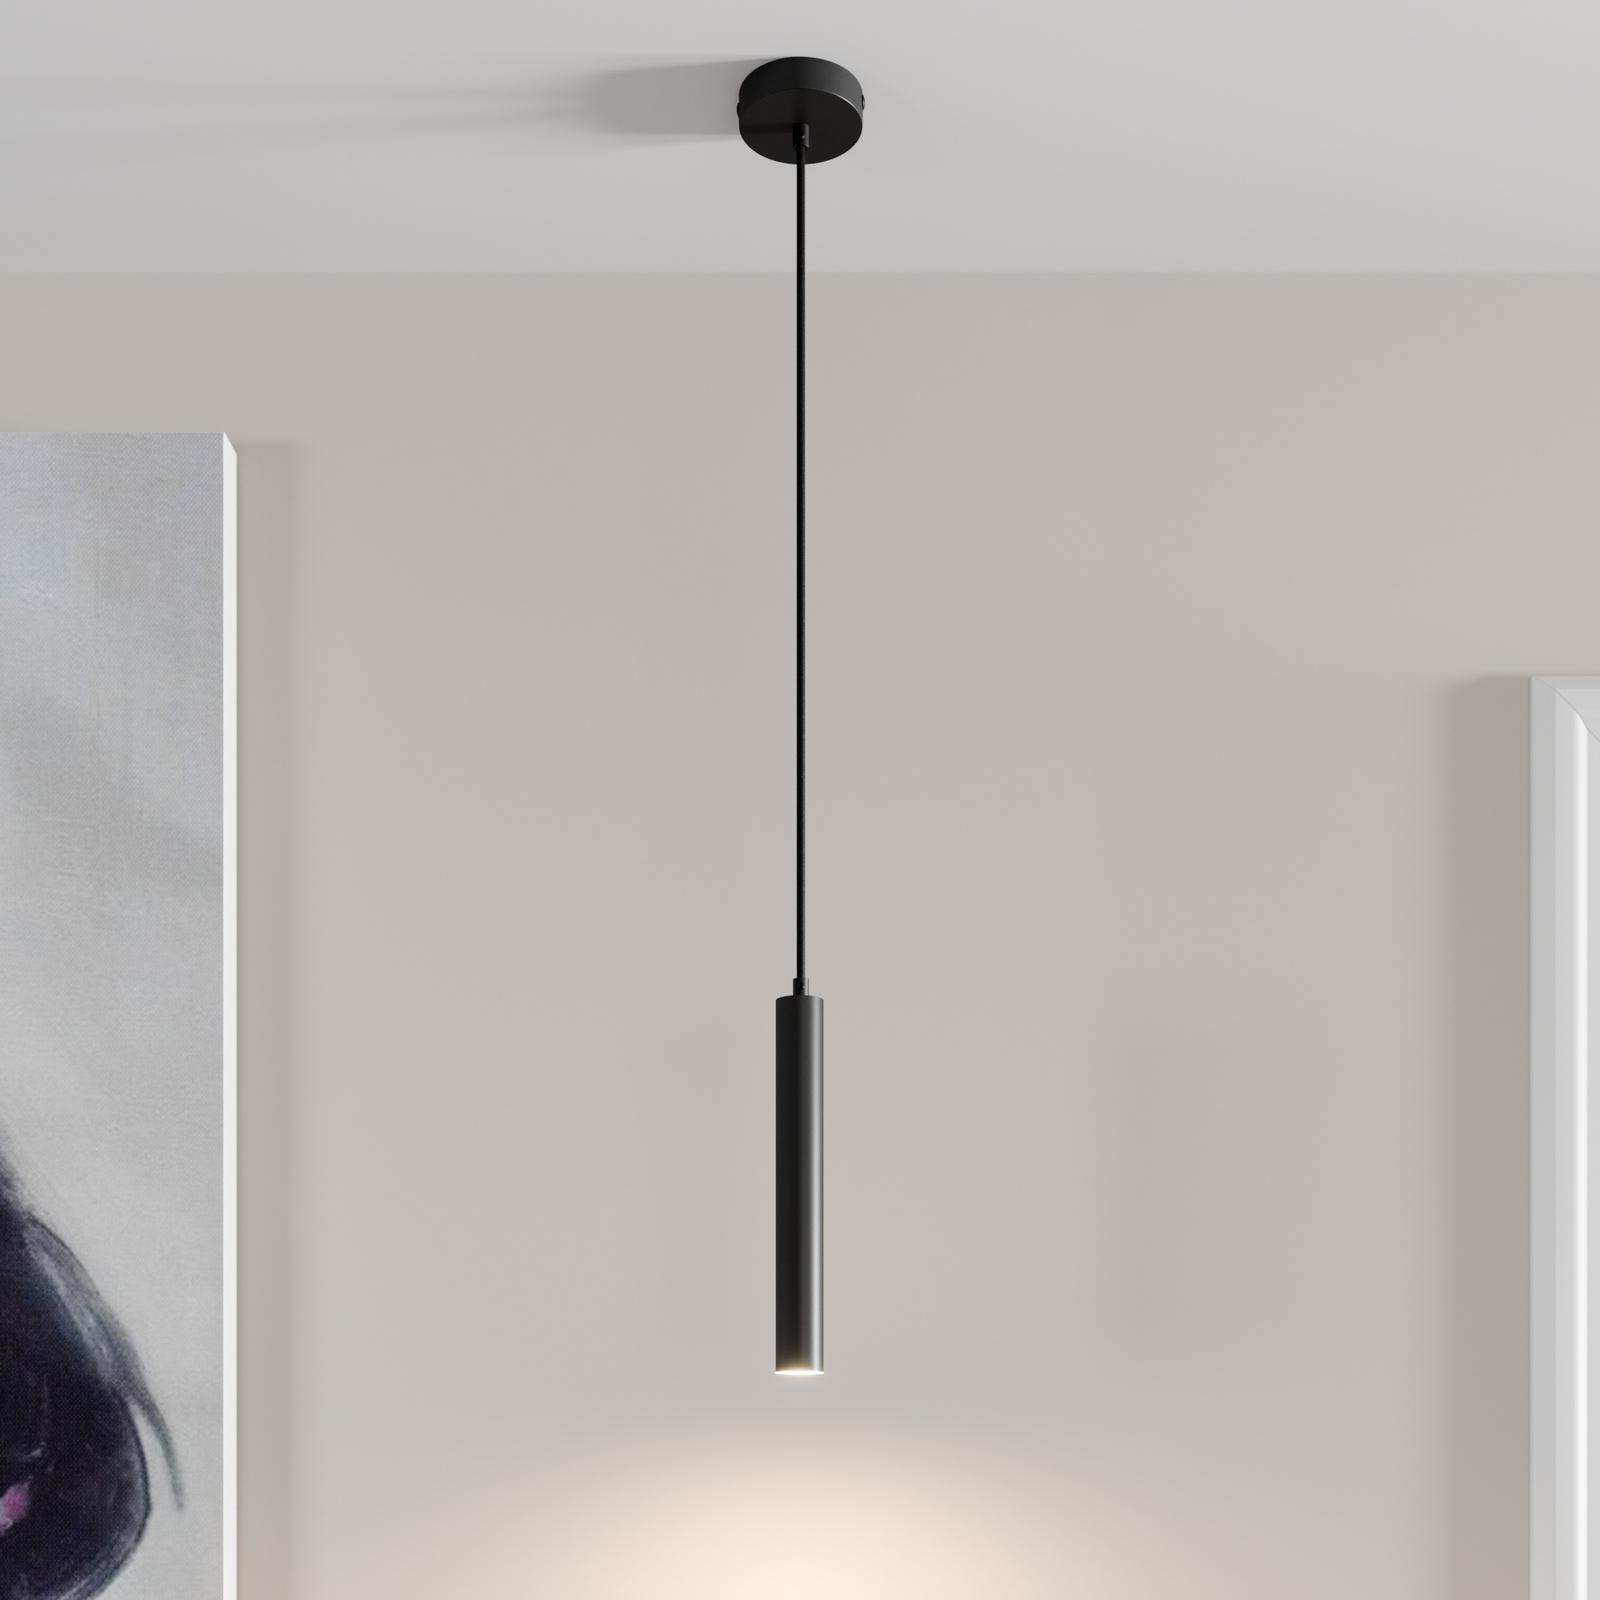 Arcchio Franka -LED-riippuvalaisin, 1-lamppuinen